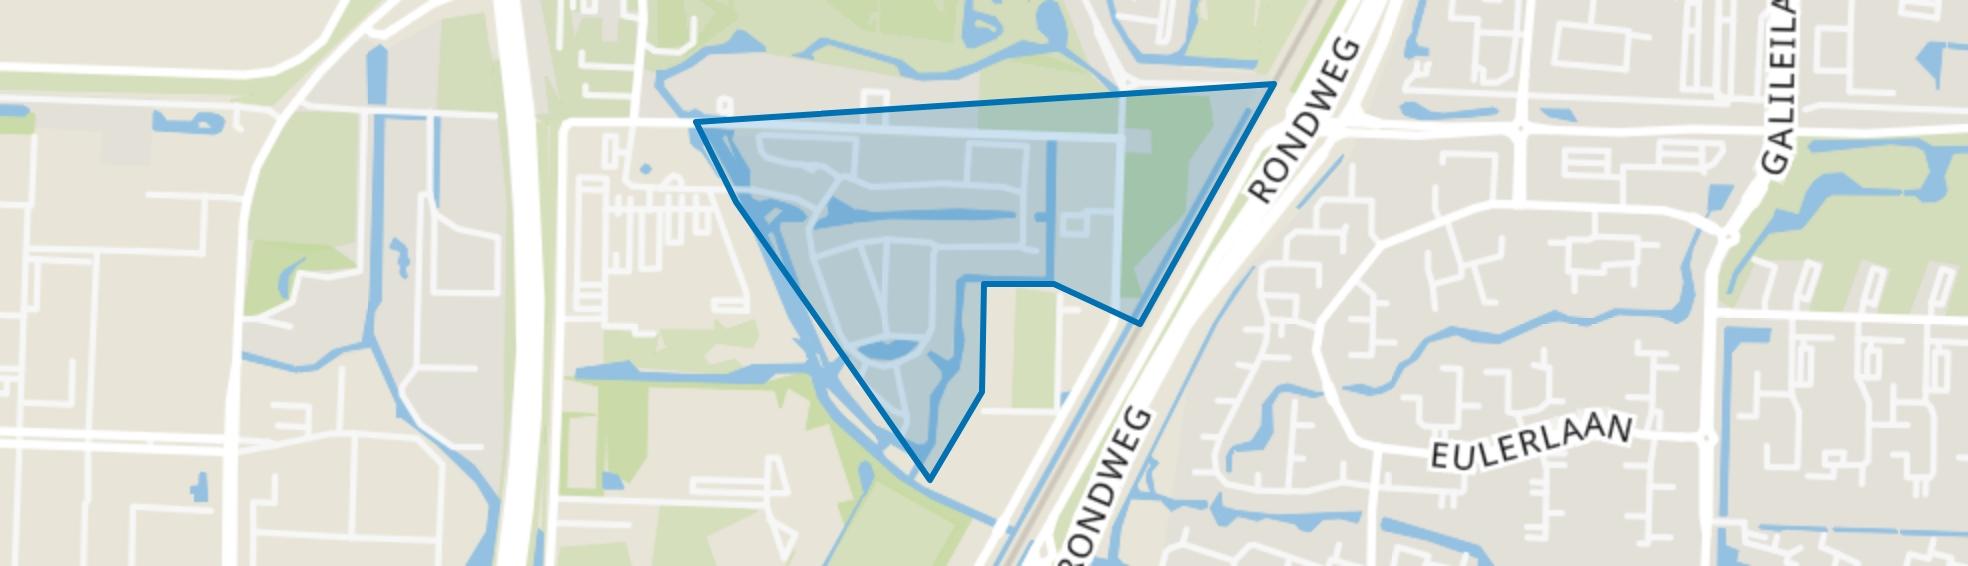 Dordtse Hout, Dordrecht map